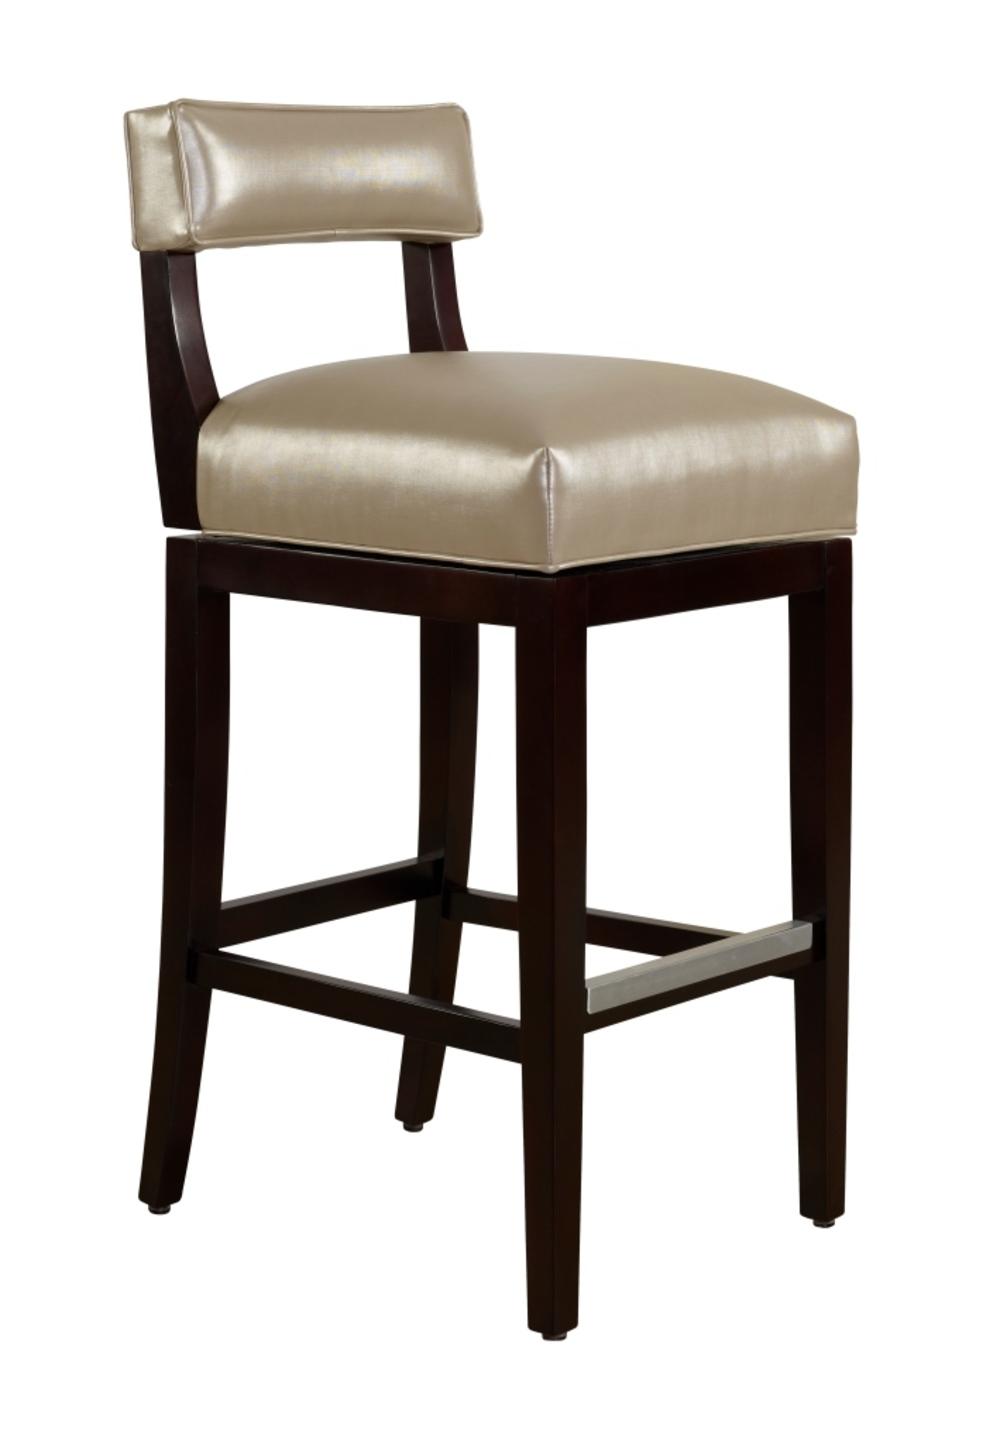 Designmaster Furniture - Kendall Bar Stool